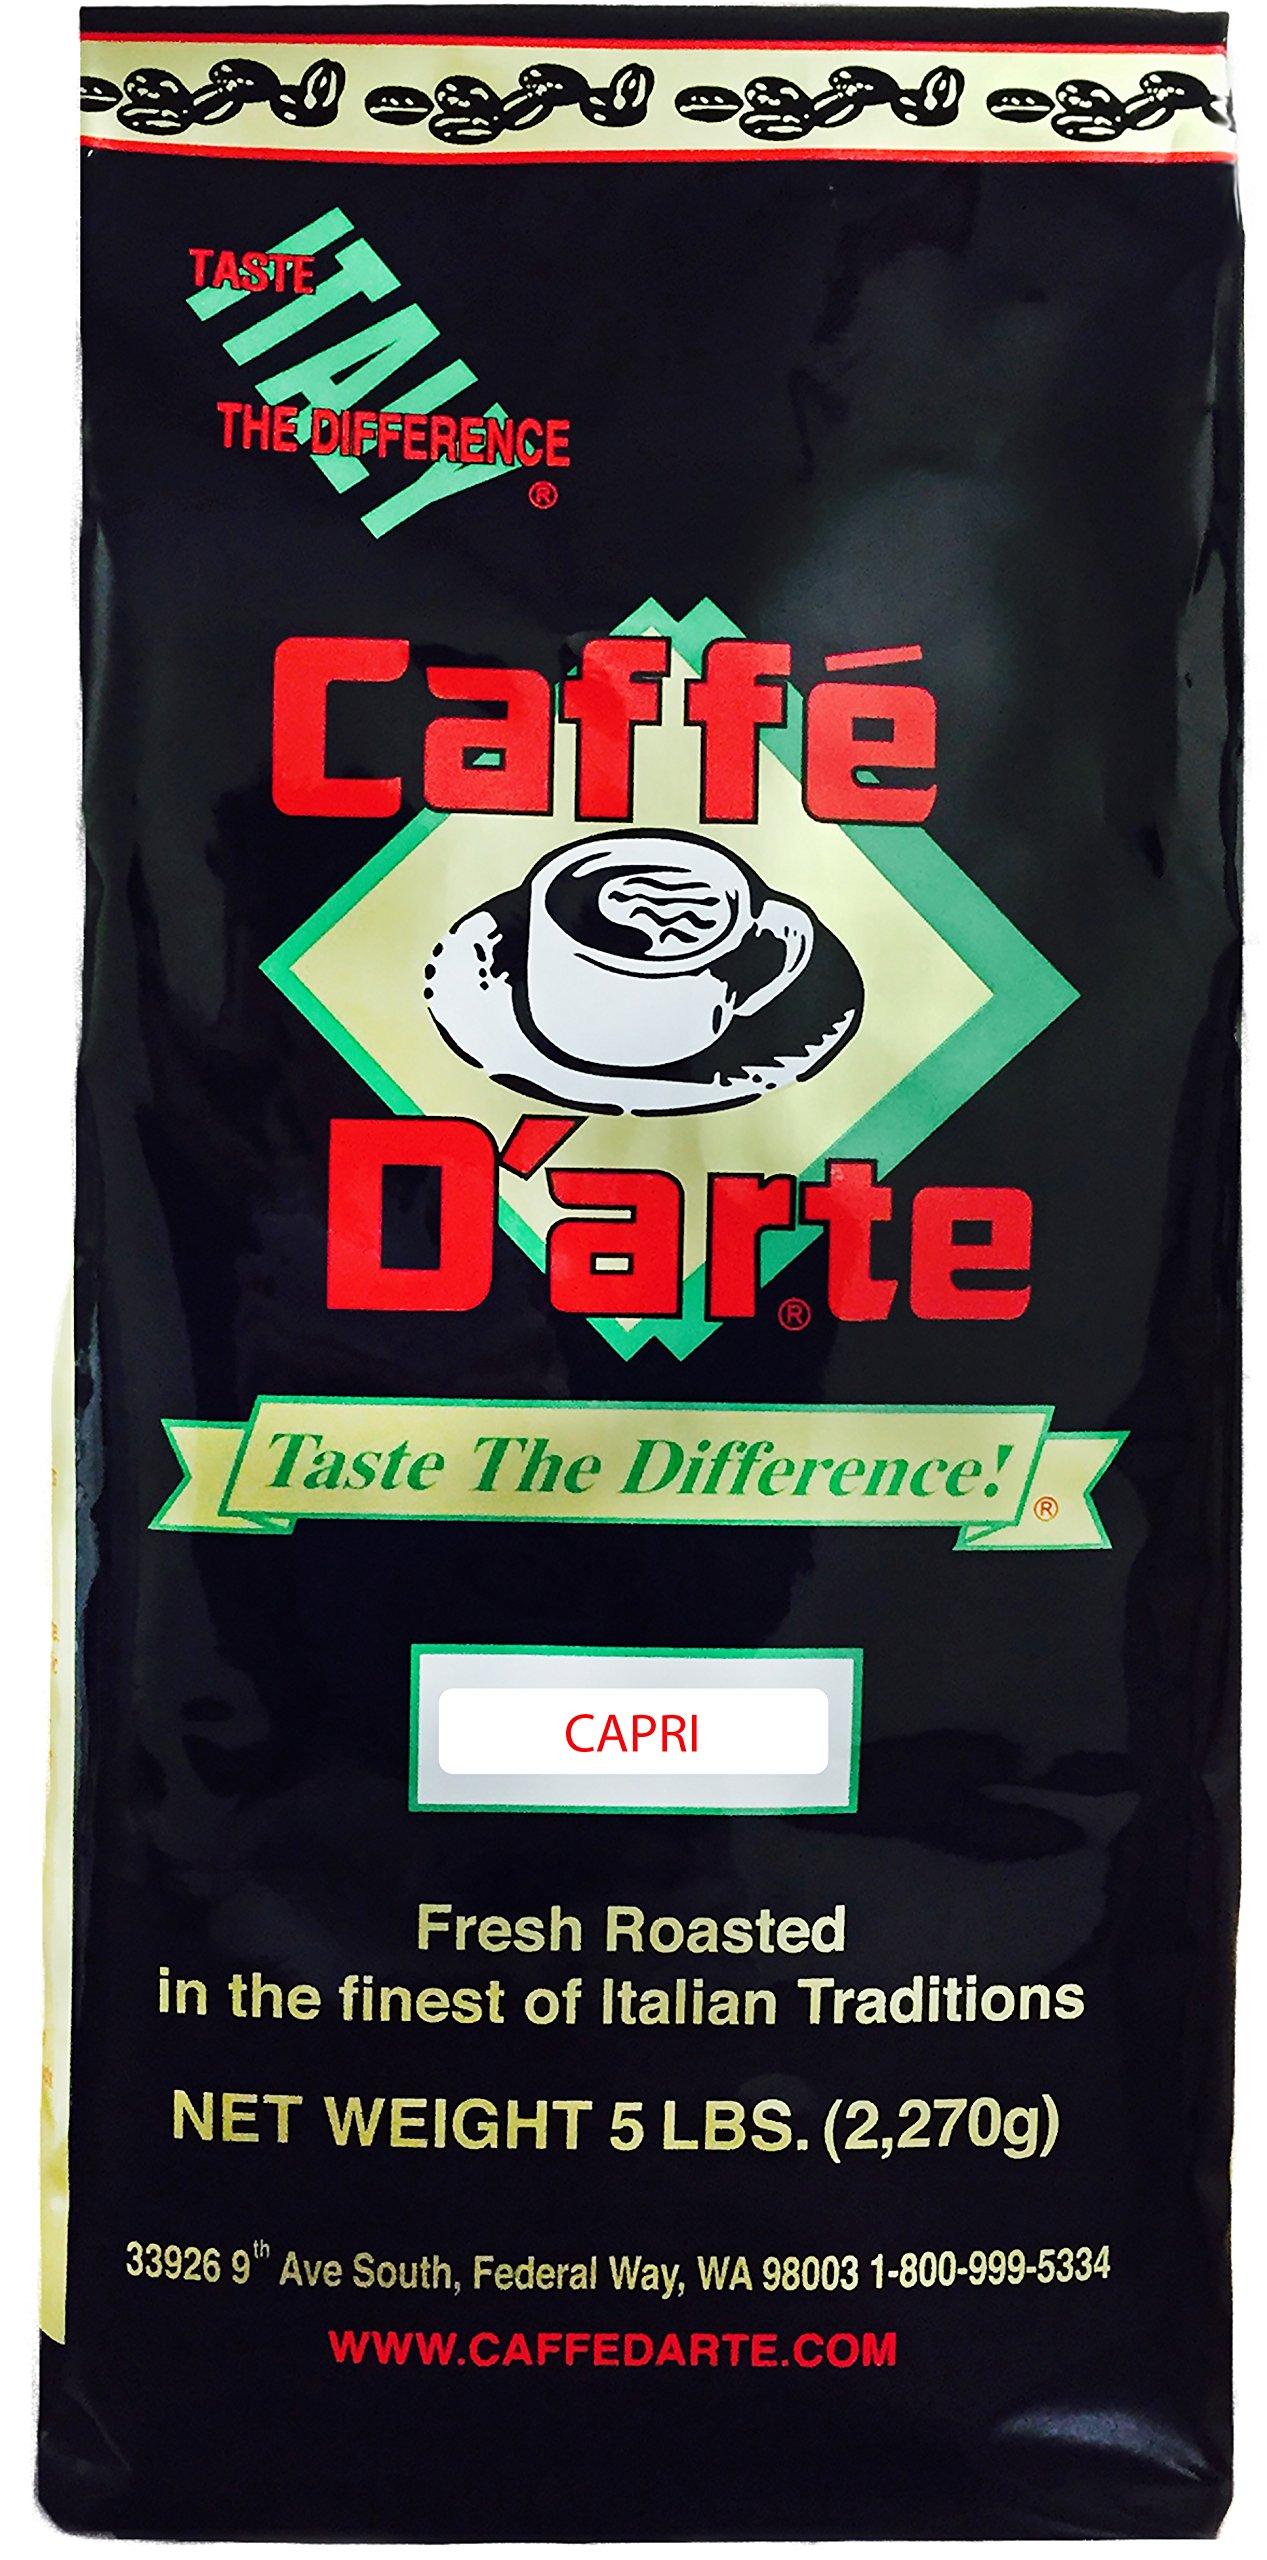 Caffe D'arte Capri Whole Bean Coffee, 5-Pound Foil Bag